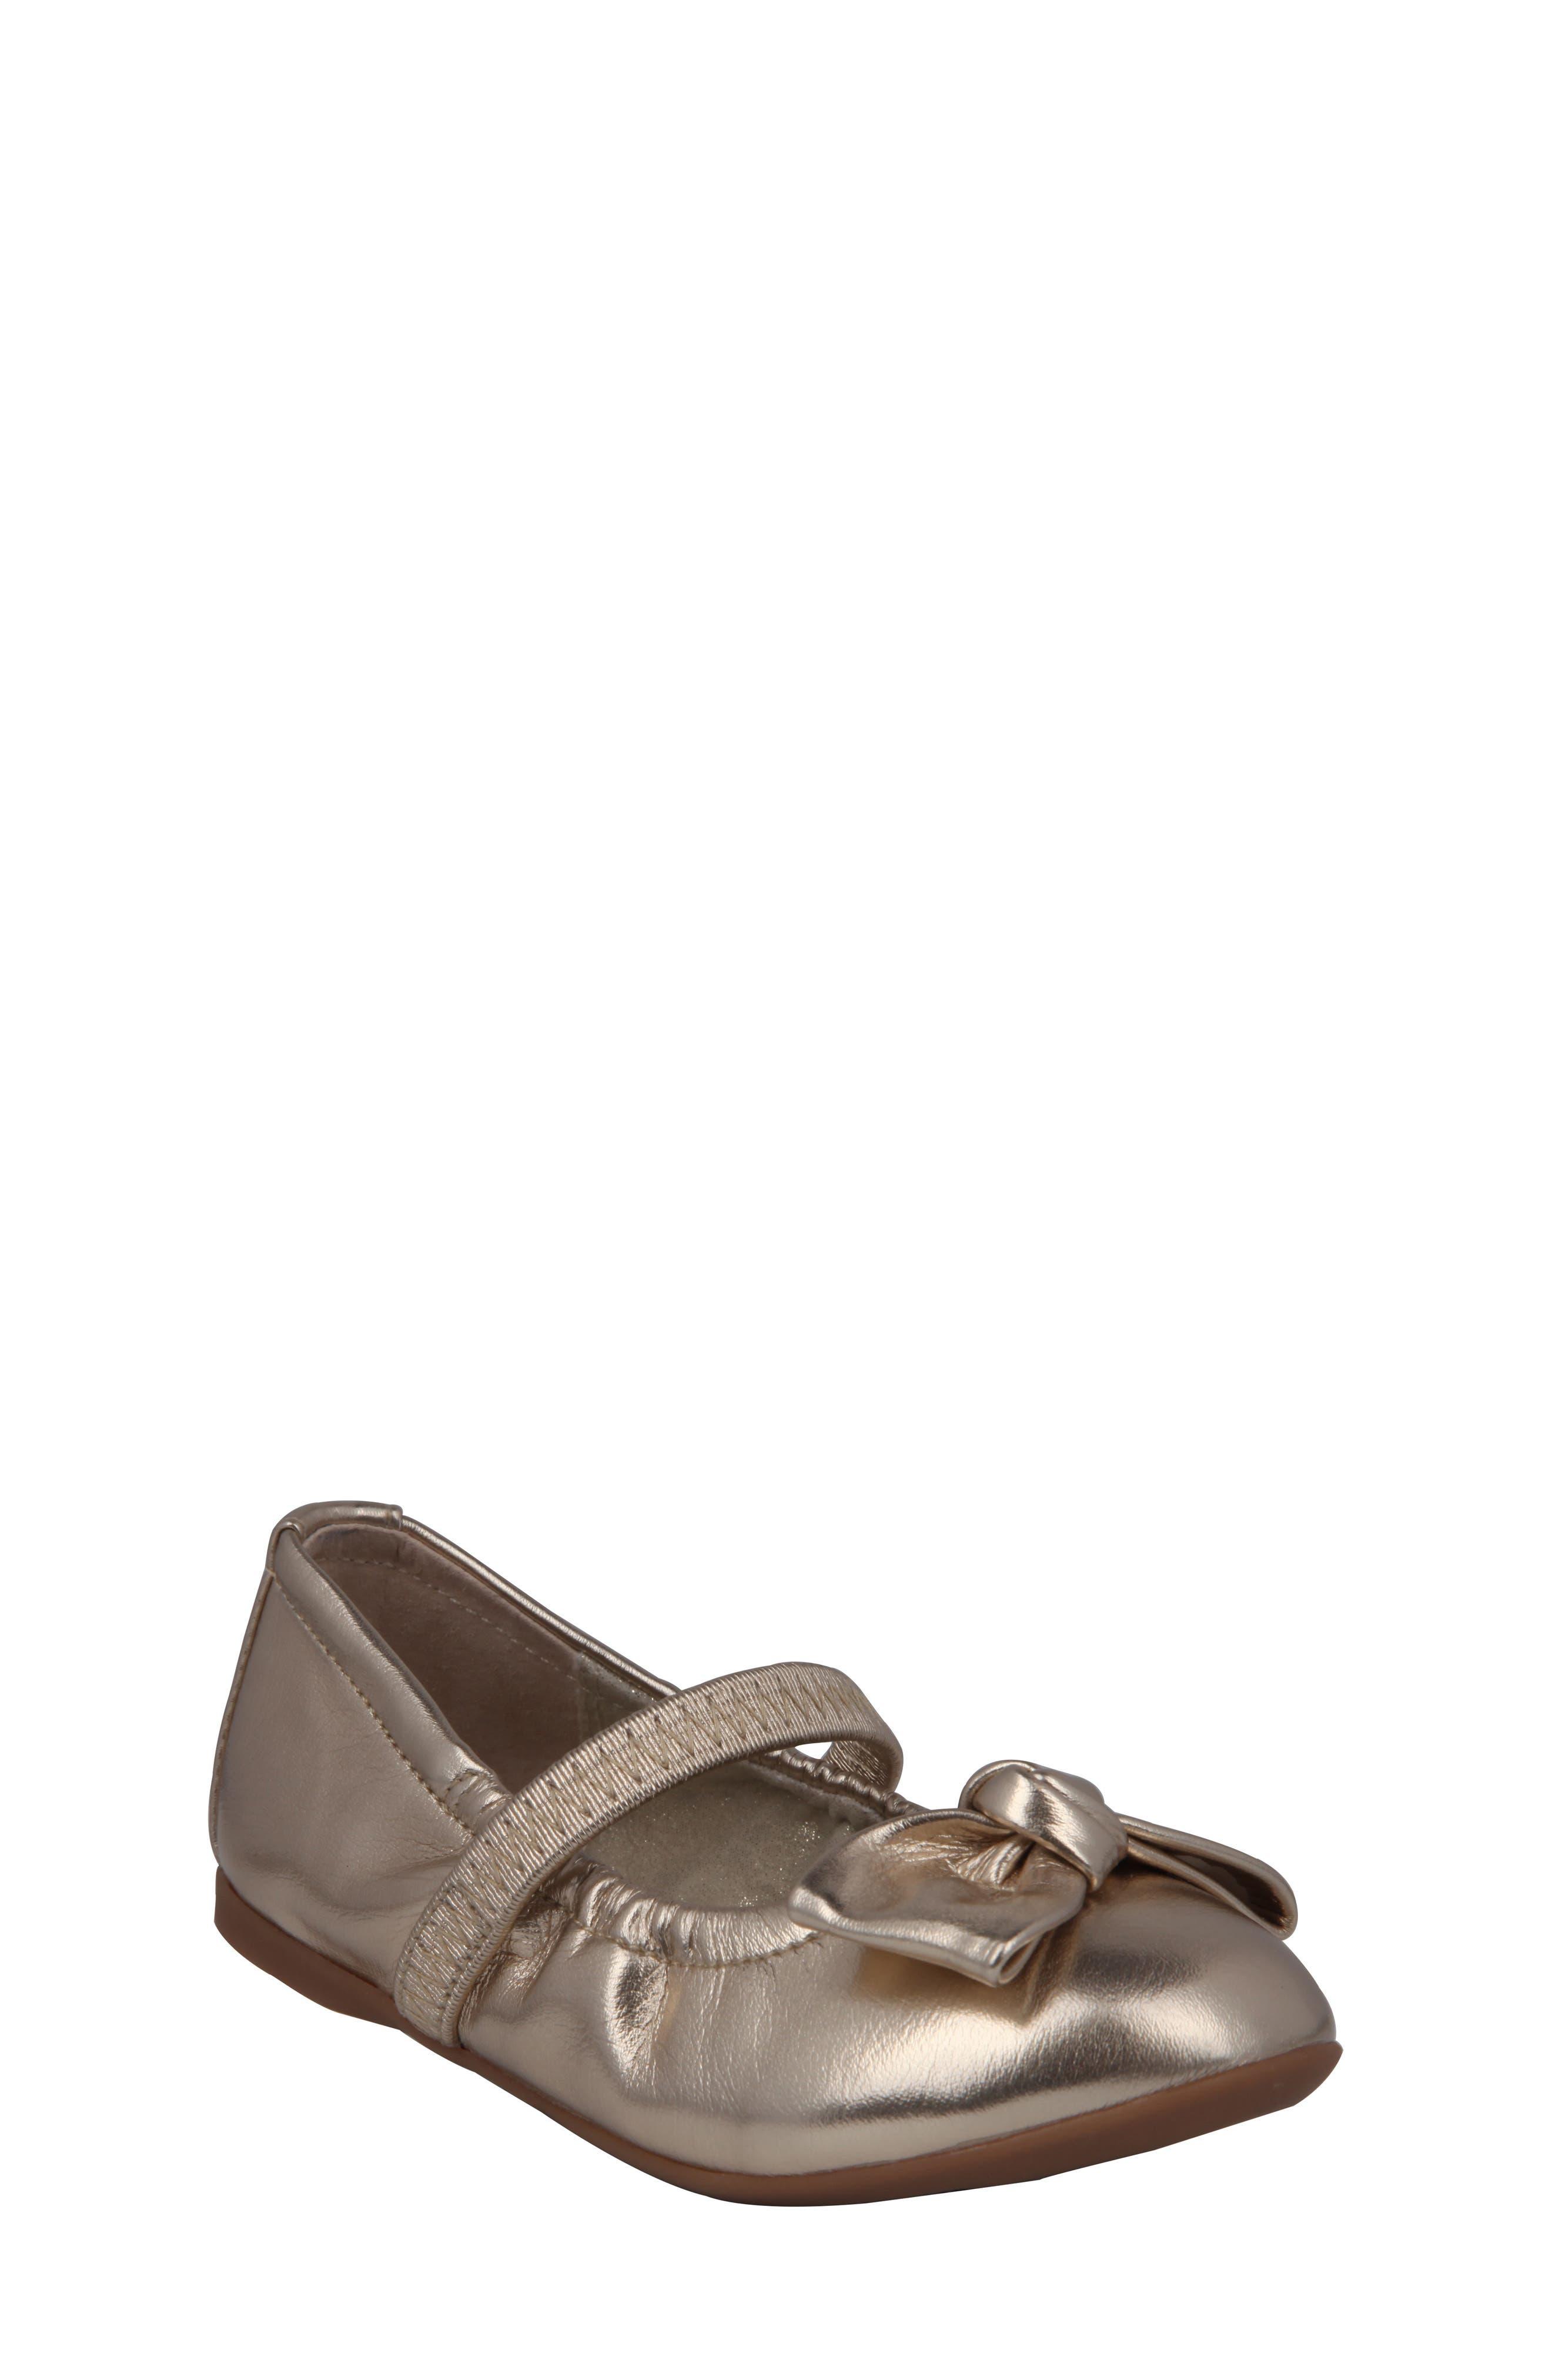 ,                             Karla Mary Jane Ballet Flat,                             Main thumbnail 15, color,                             040